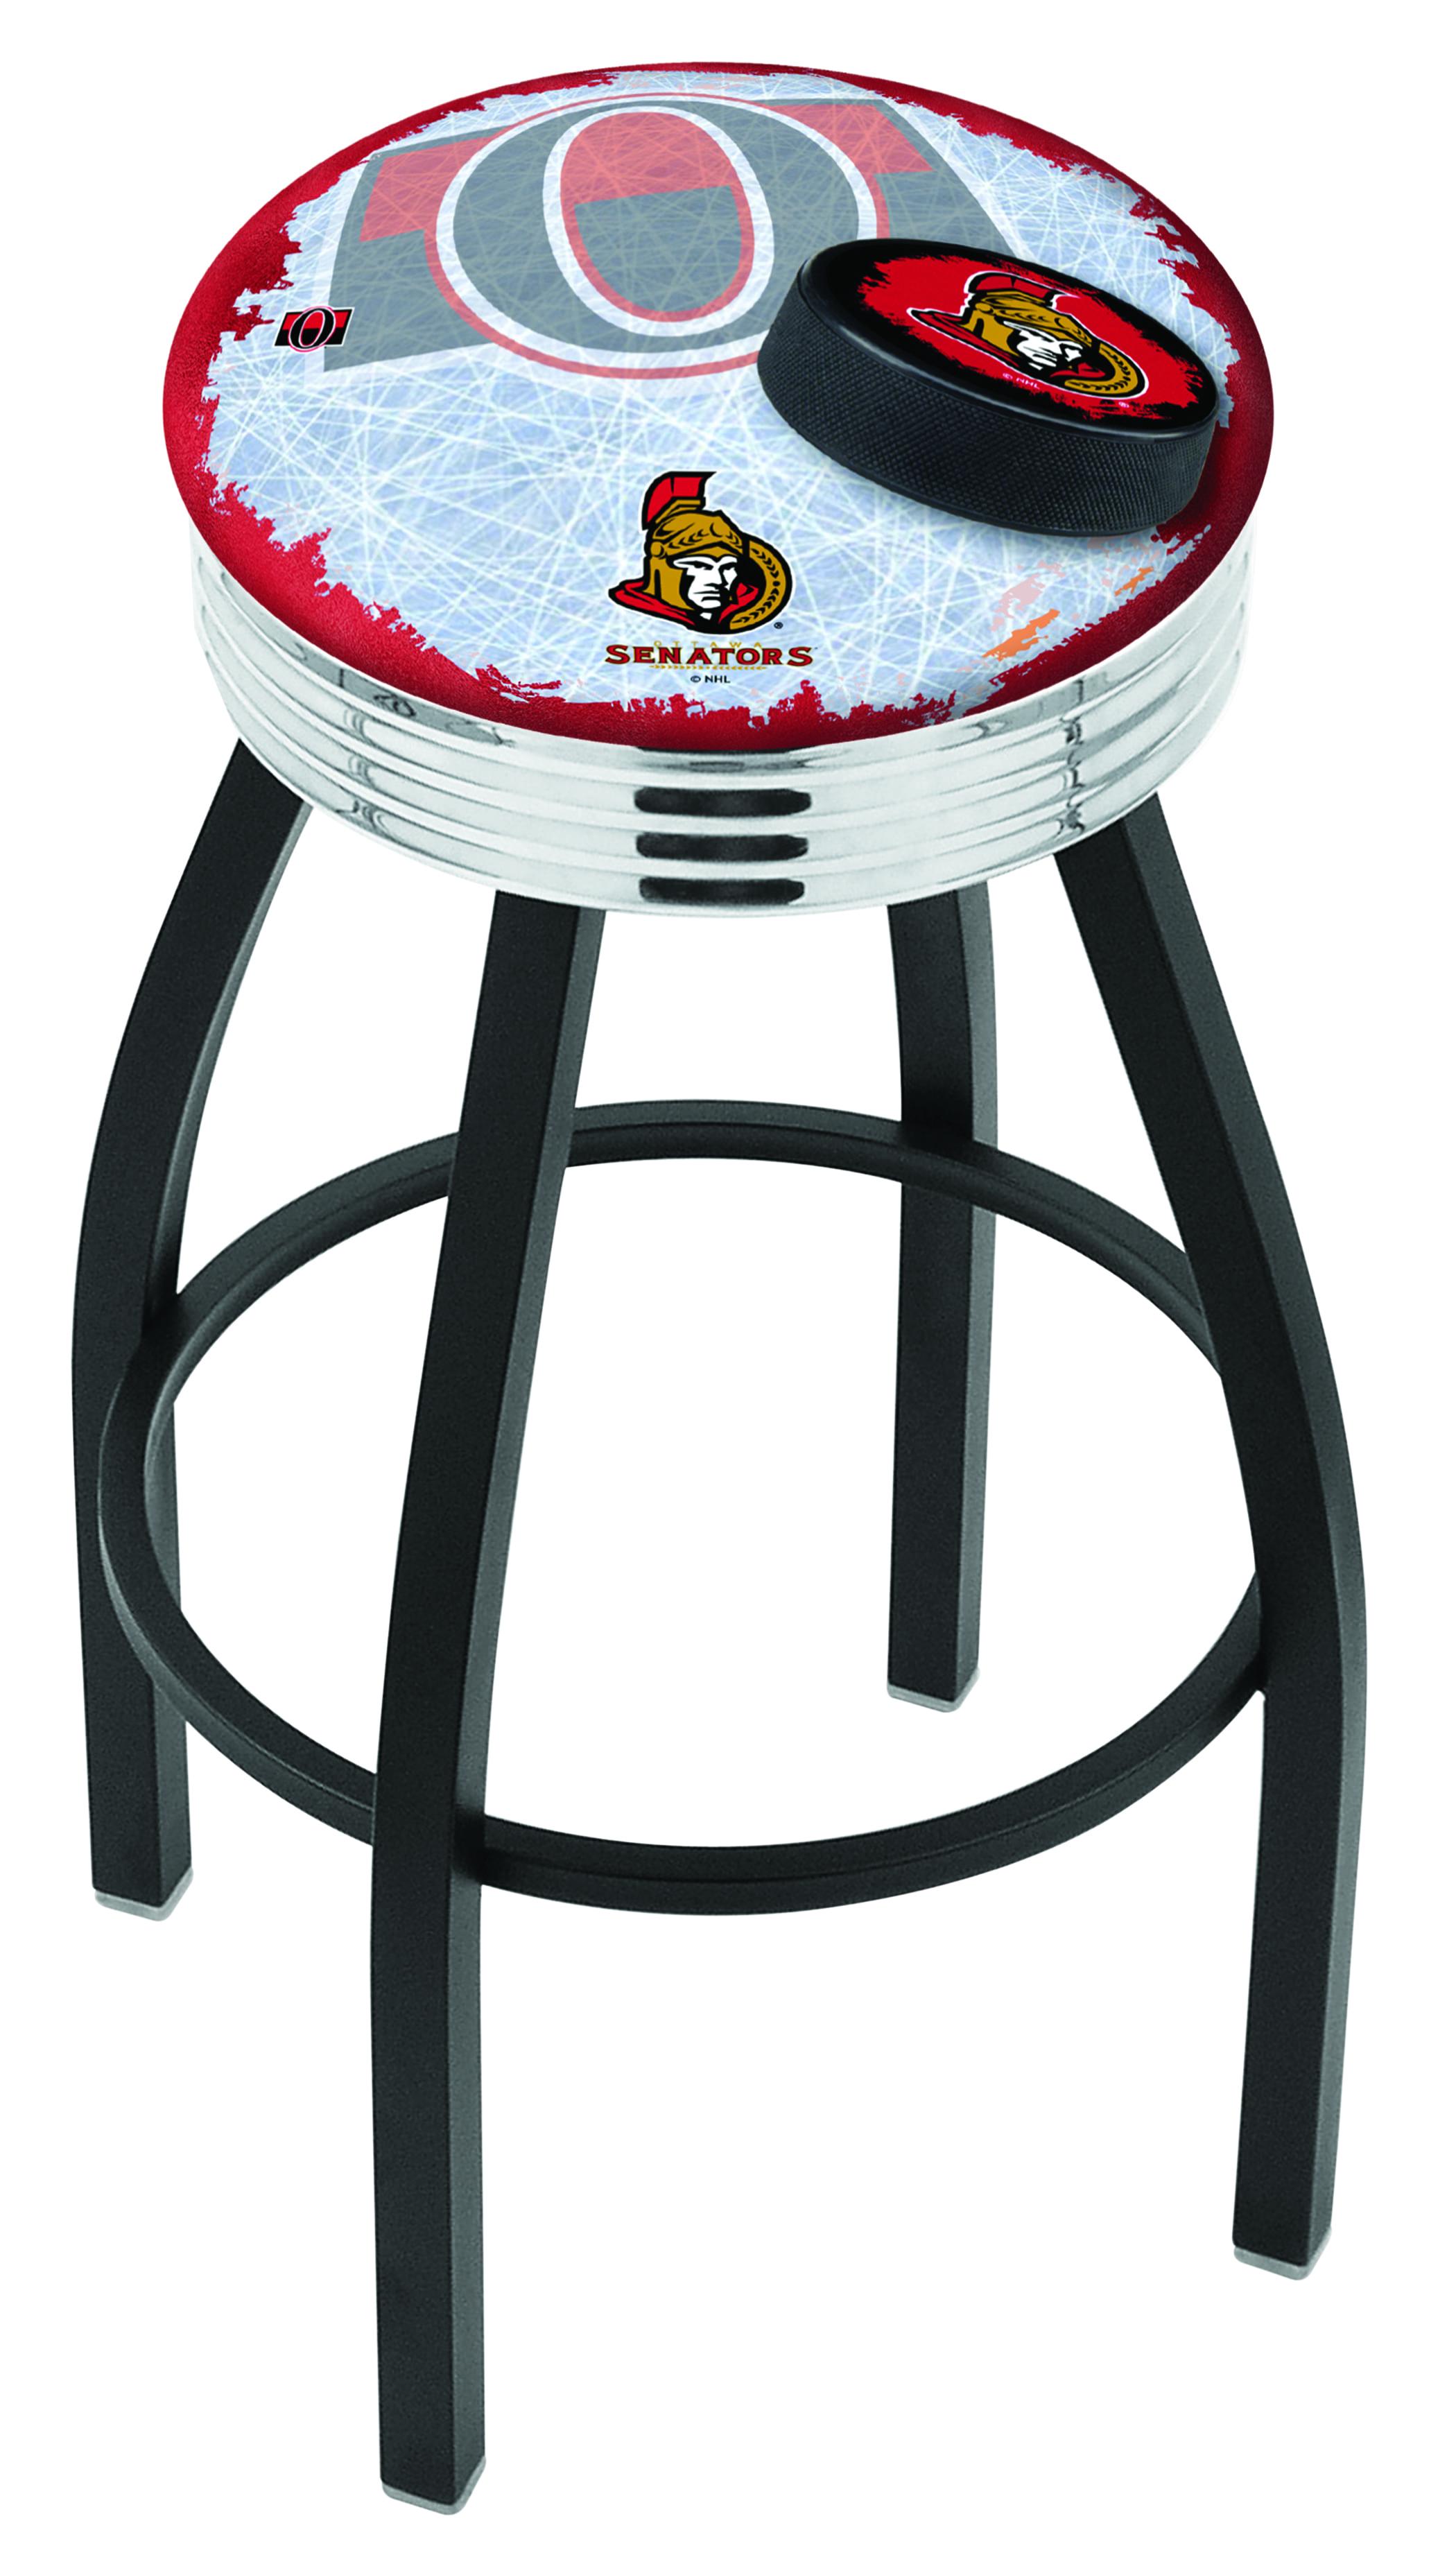 Ottawa Senators Bar Stool w/ Official NHL Logo   Family ...